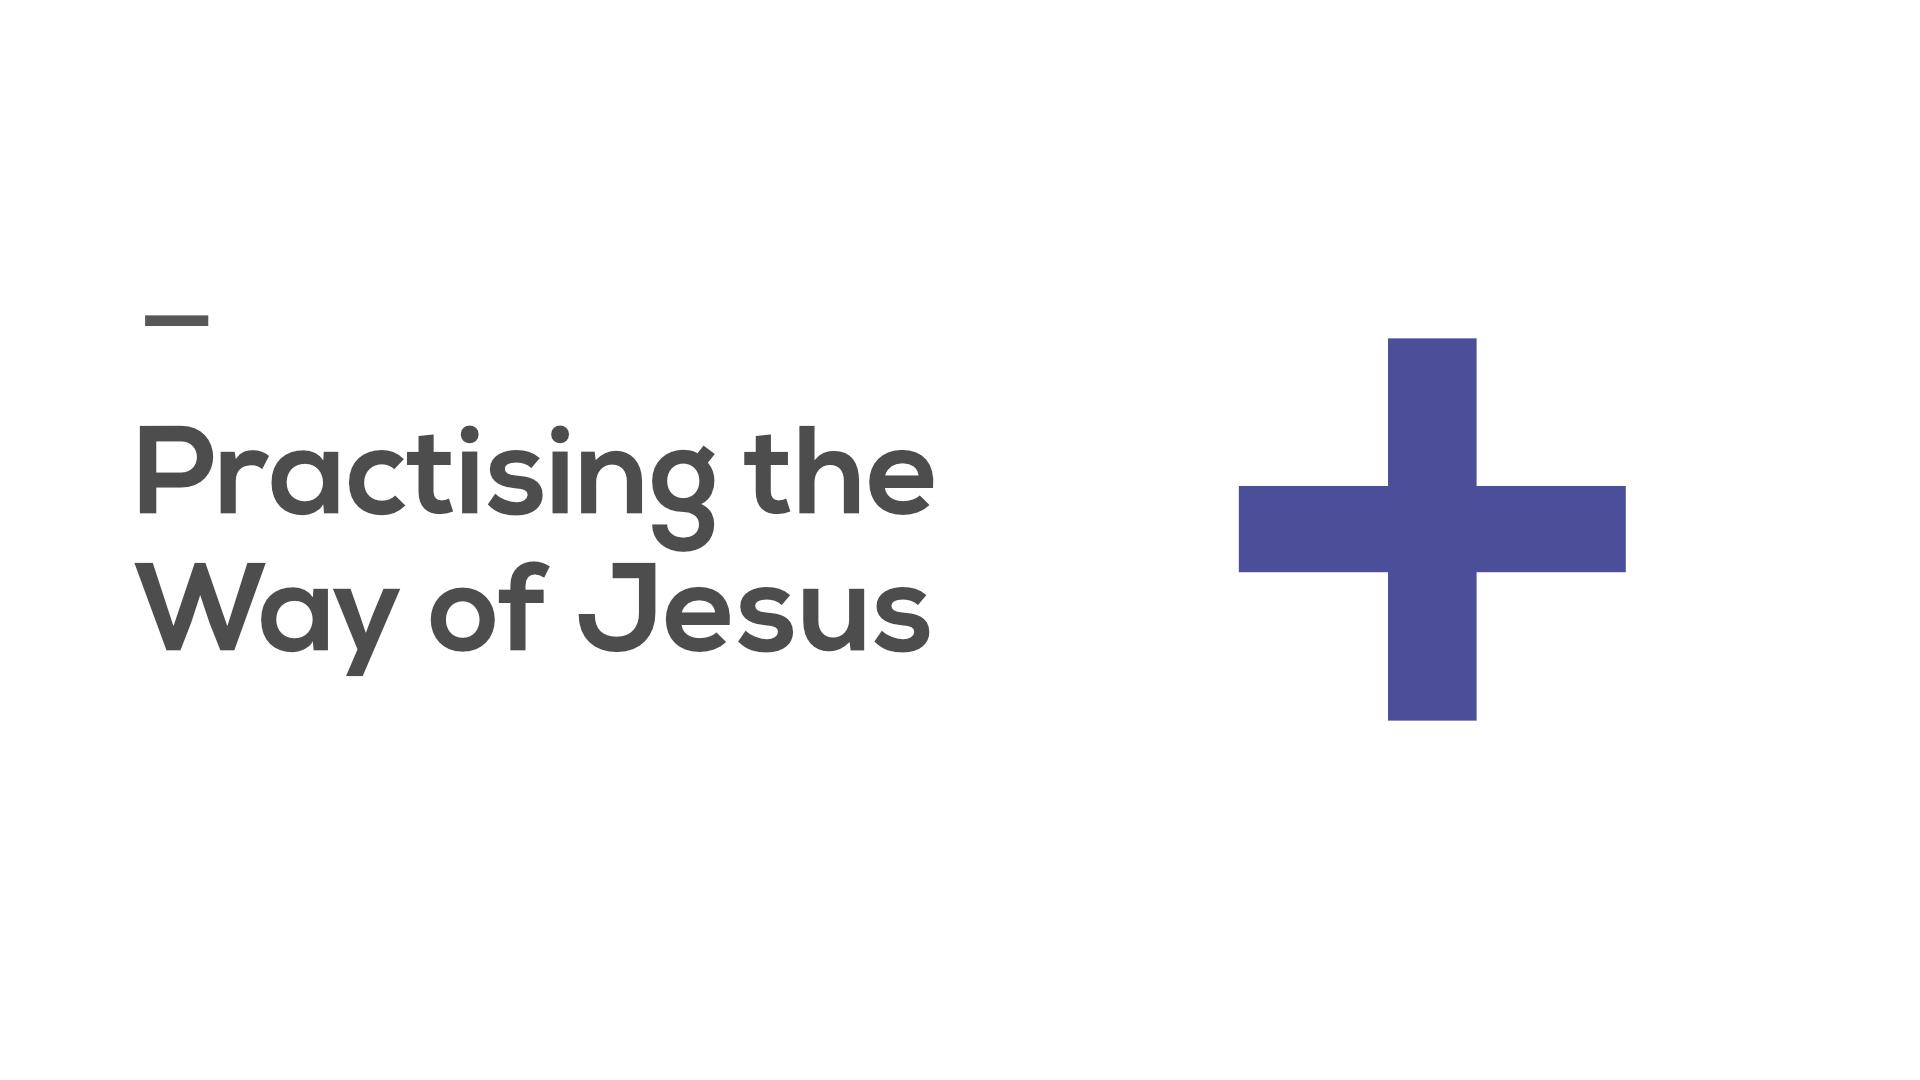 Practising the Way of Jesus 1.jpg